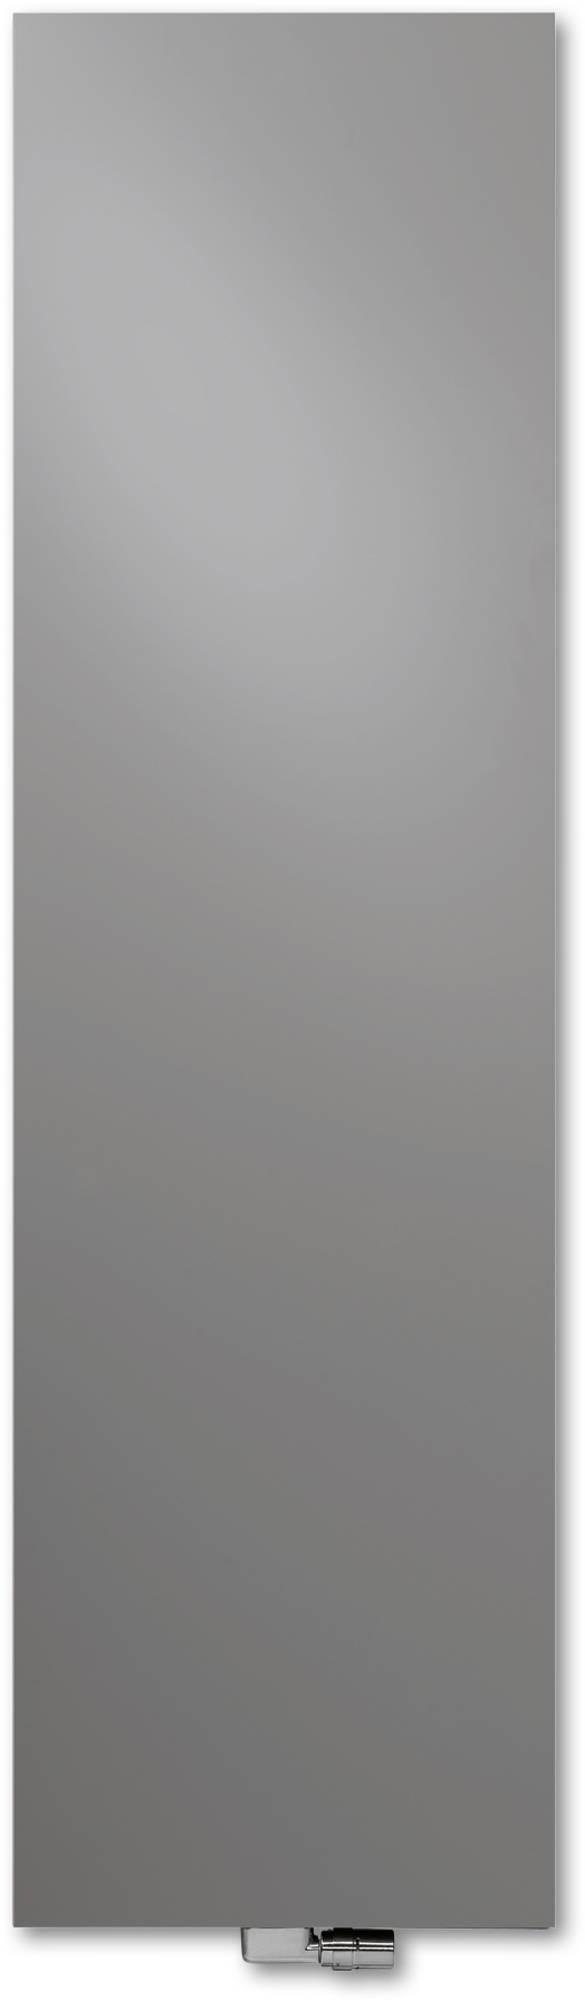 Vasco Niva Verticaal N1L1 Designradiator 202x72 cm Licht Beige